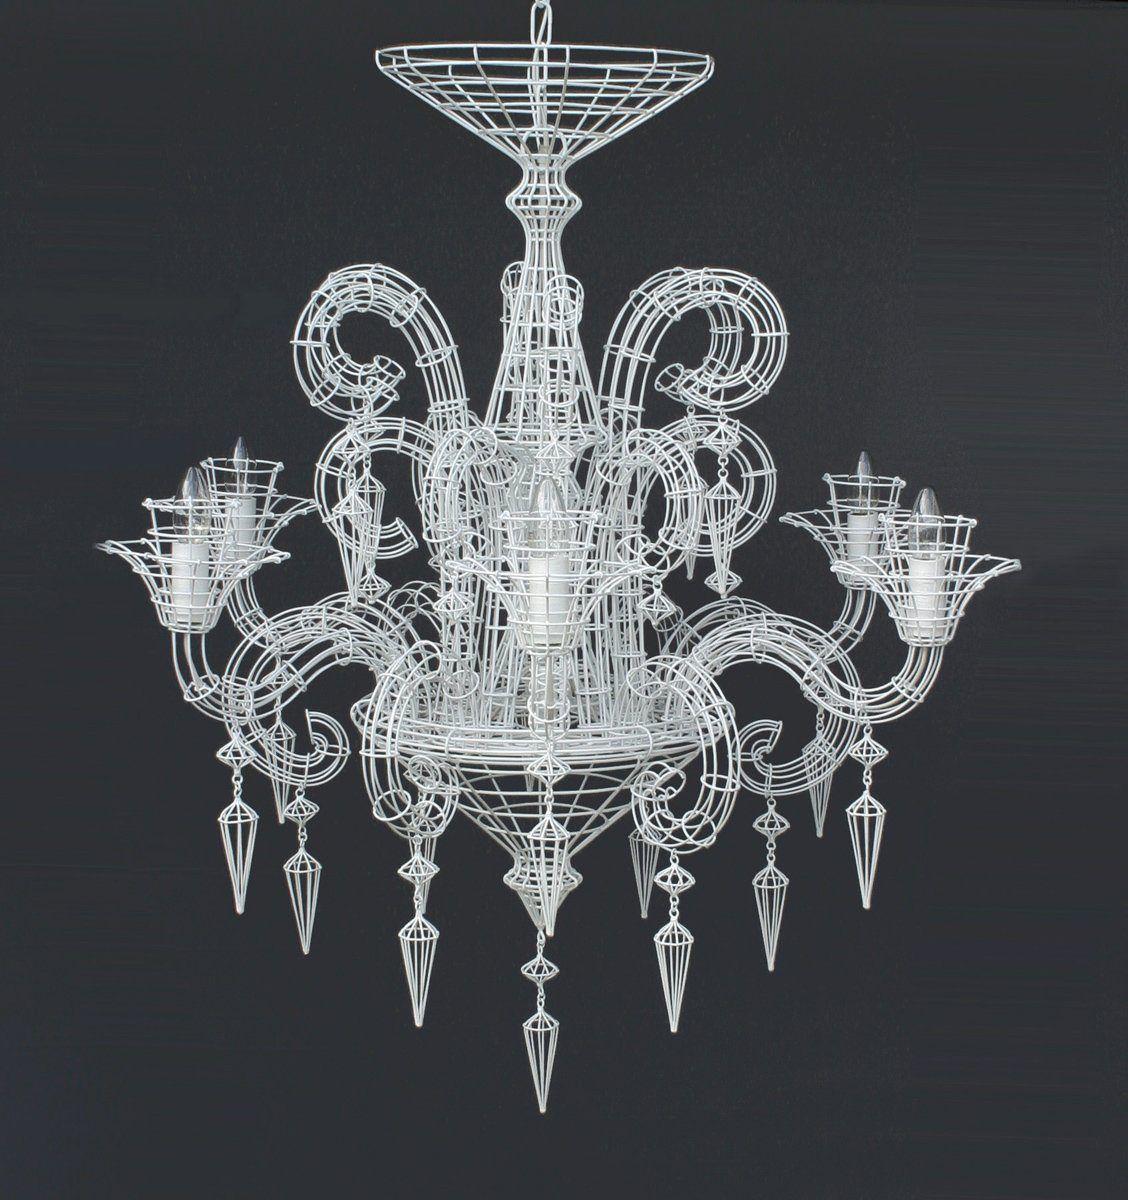 Neo baroque chandelier white neo baroque chandelier white abigail ahern aloadofball Images